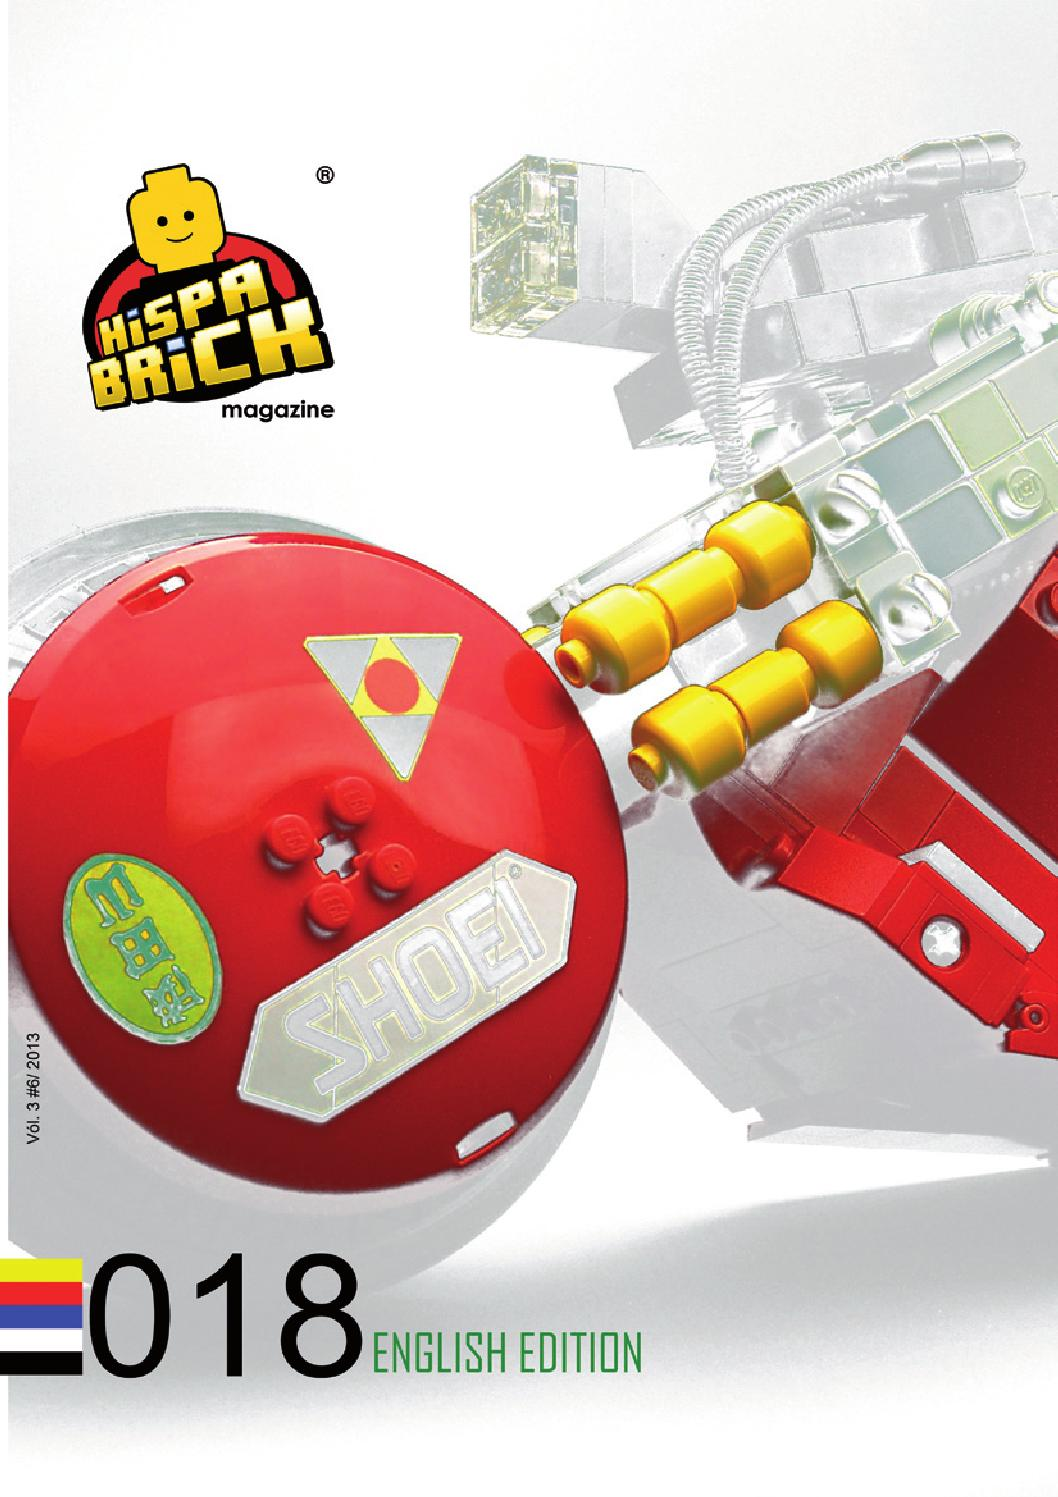 Lego 48092 Brick Round Corner 4 x 4 Macaroni Wide with 3 Studs JOB LOT Select Co